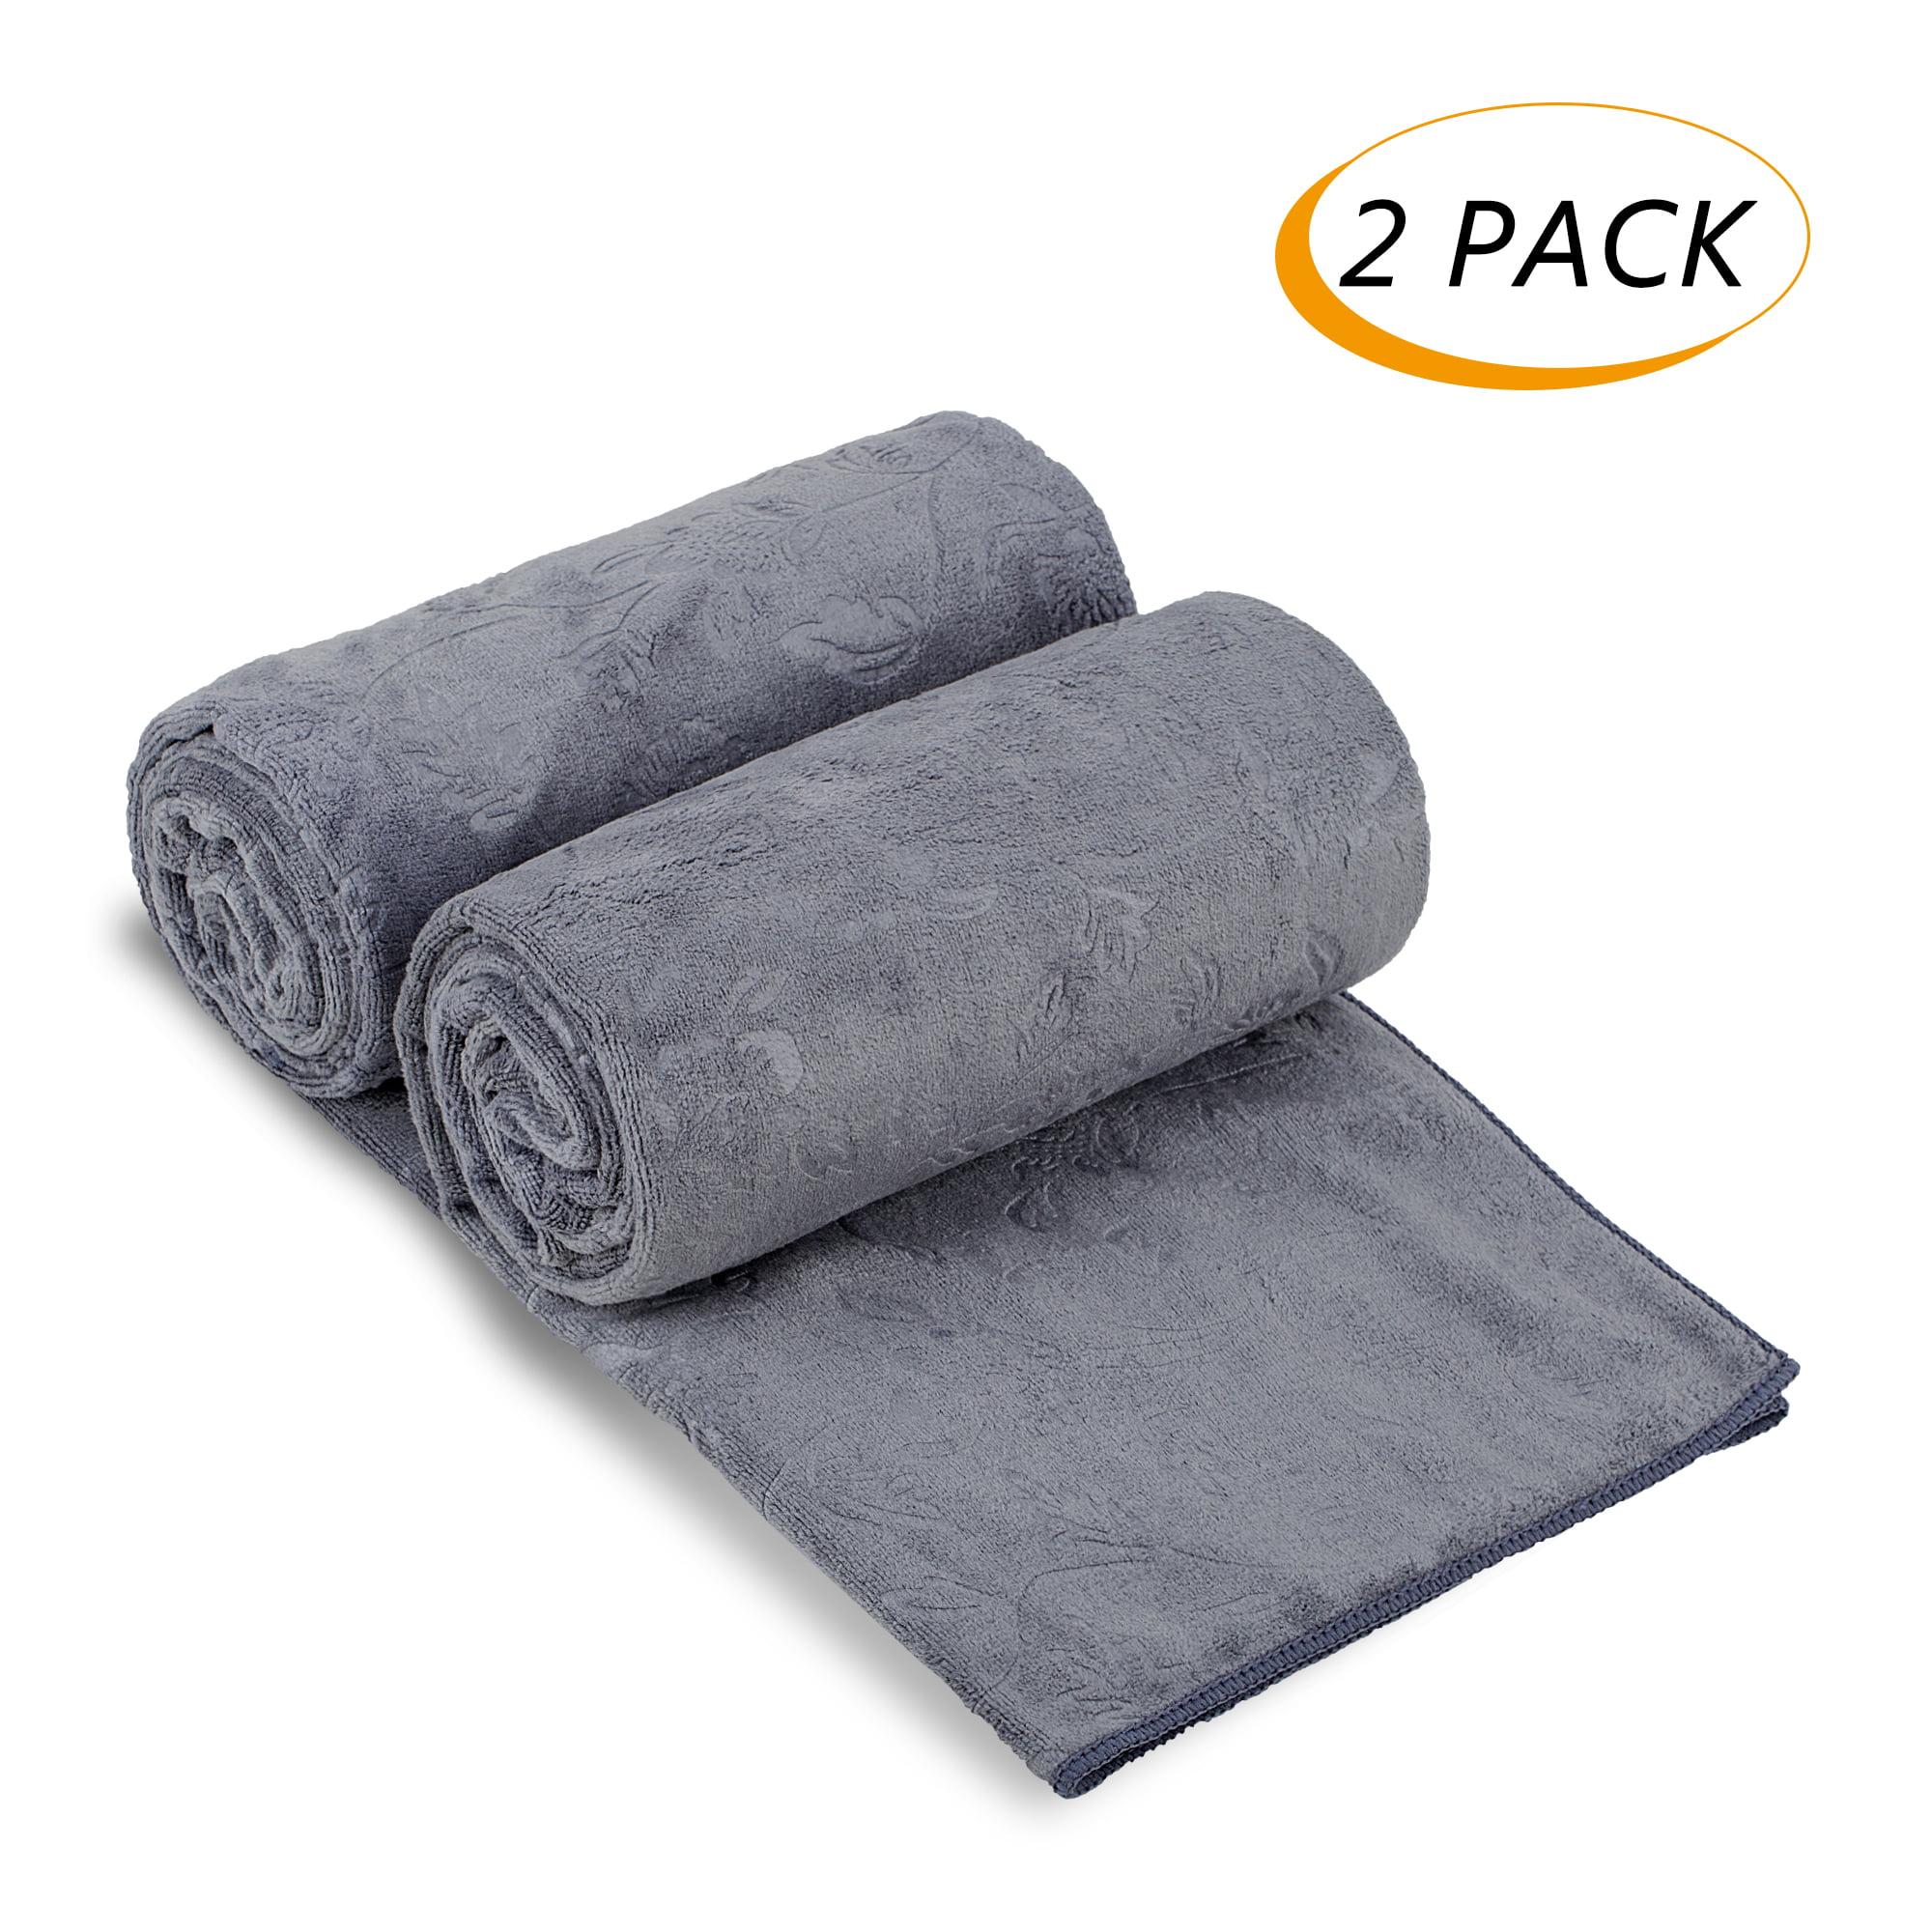 "JML Bath Towel, 2 Pack Microfiber Bath Towel Sets (30"" x 60"") Extra Absorbent,... by JML"